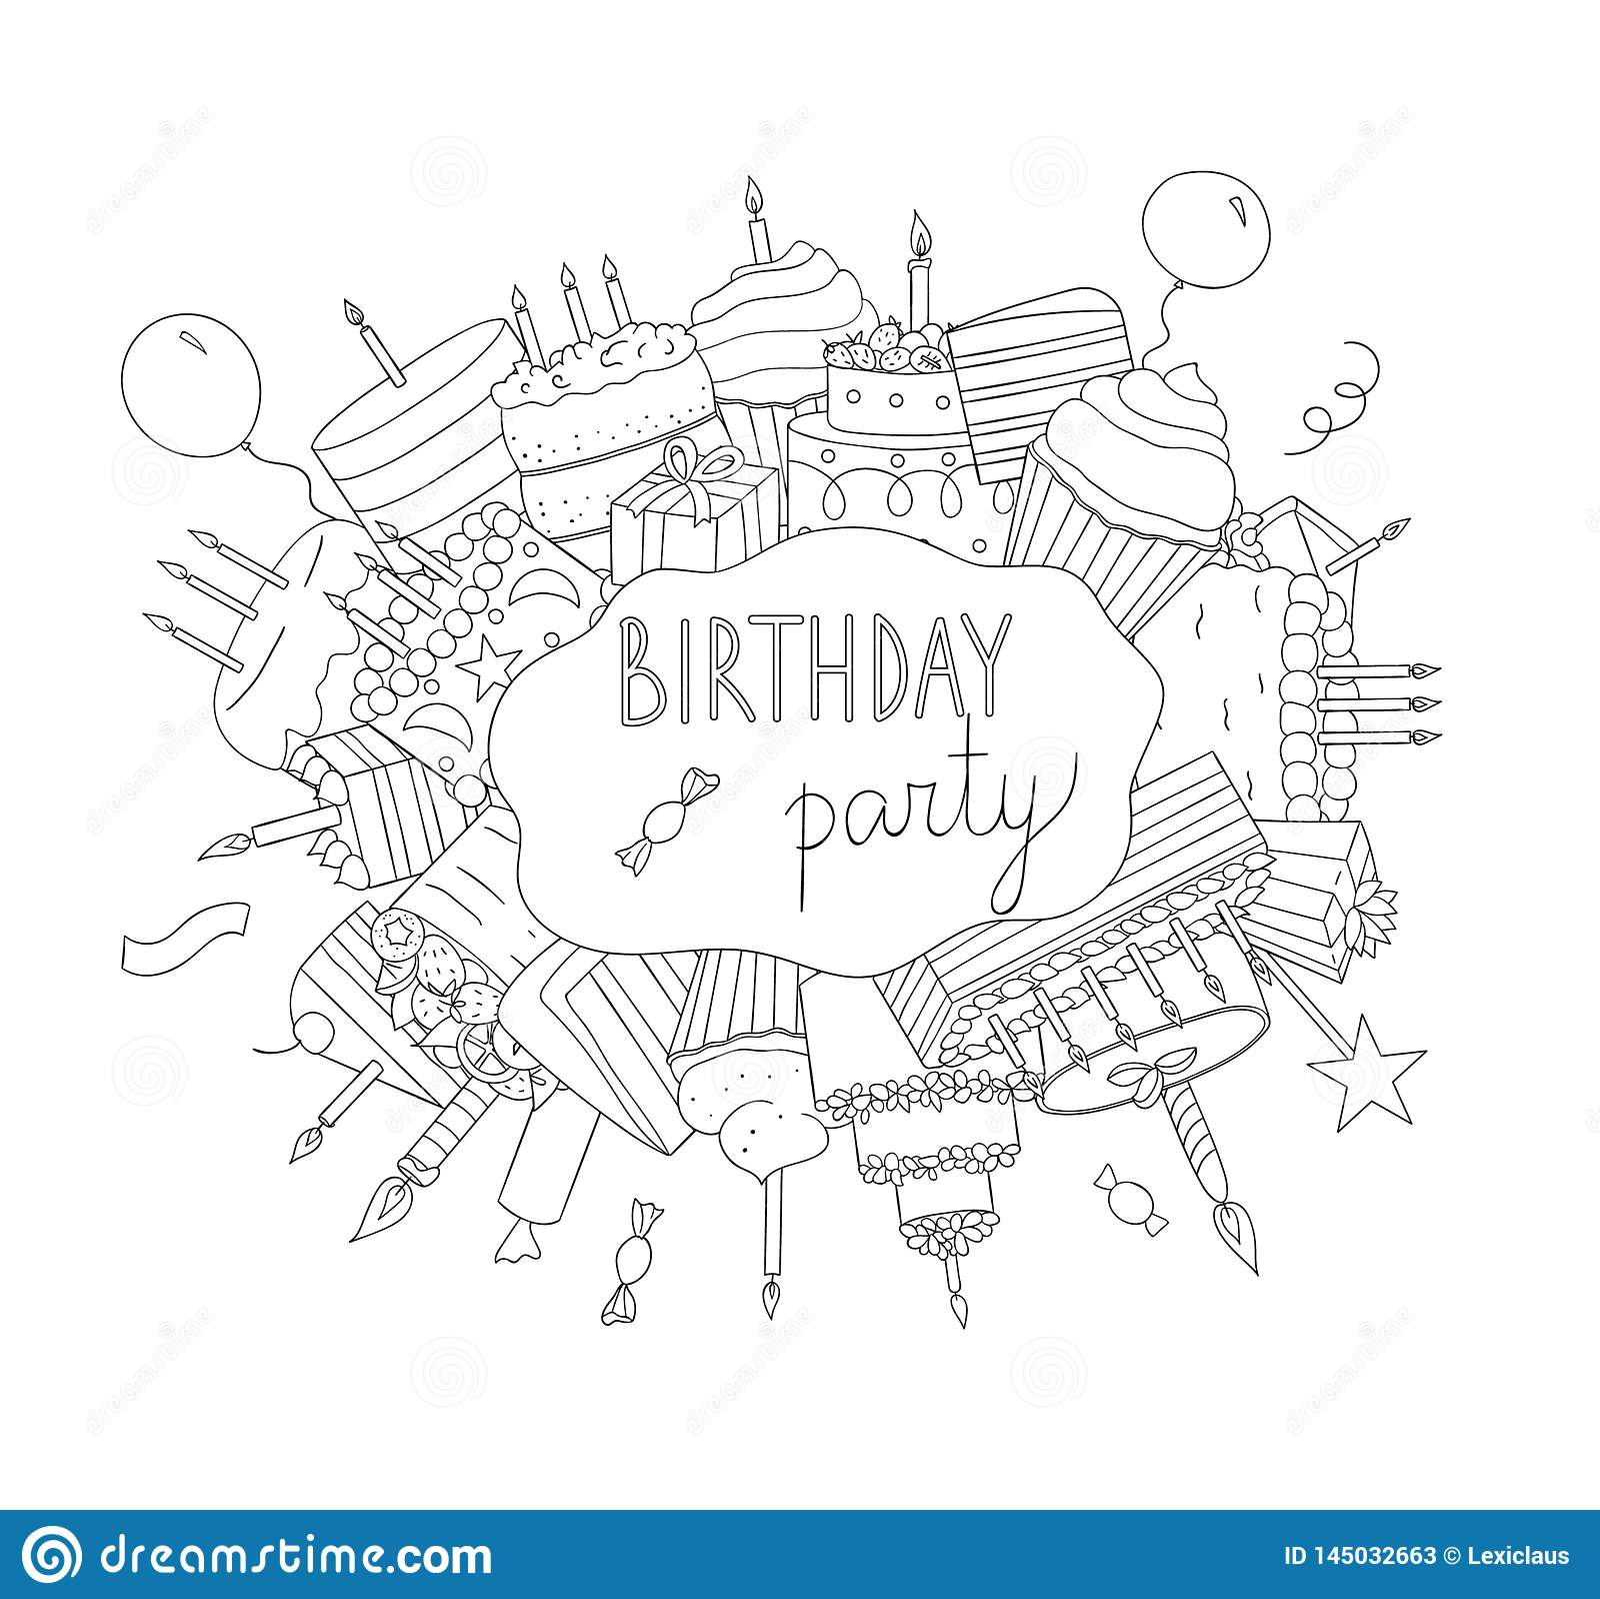 Birthday black and white elements